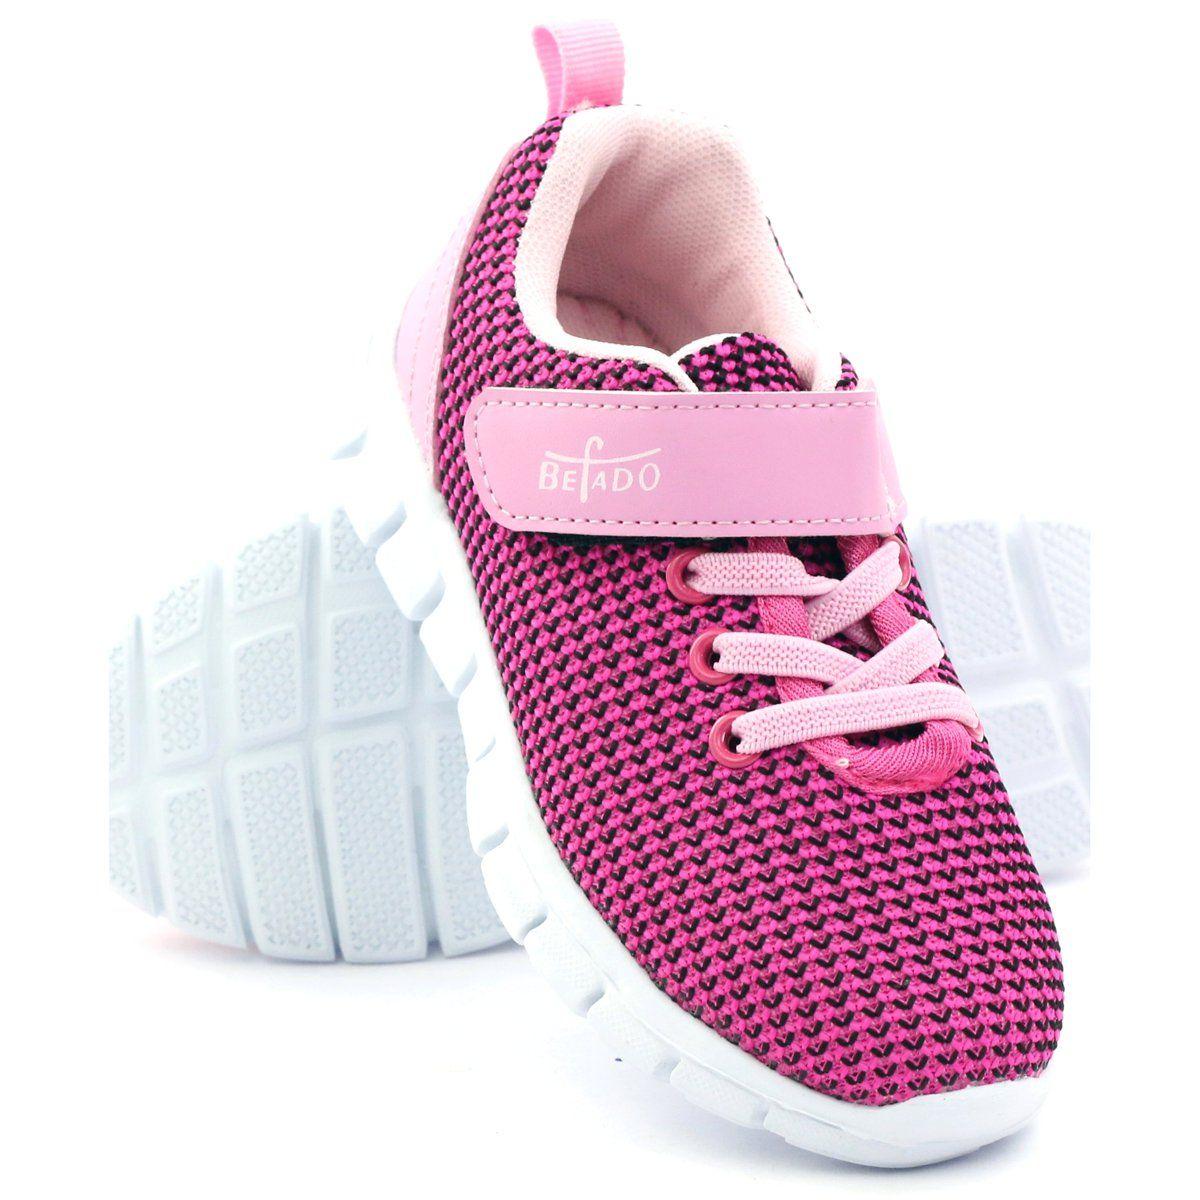 Sportowe Na Rzep Befado 516x011 Rozowe Baby Shoes Shoes Fashion